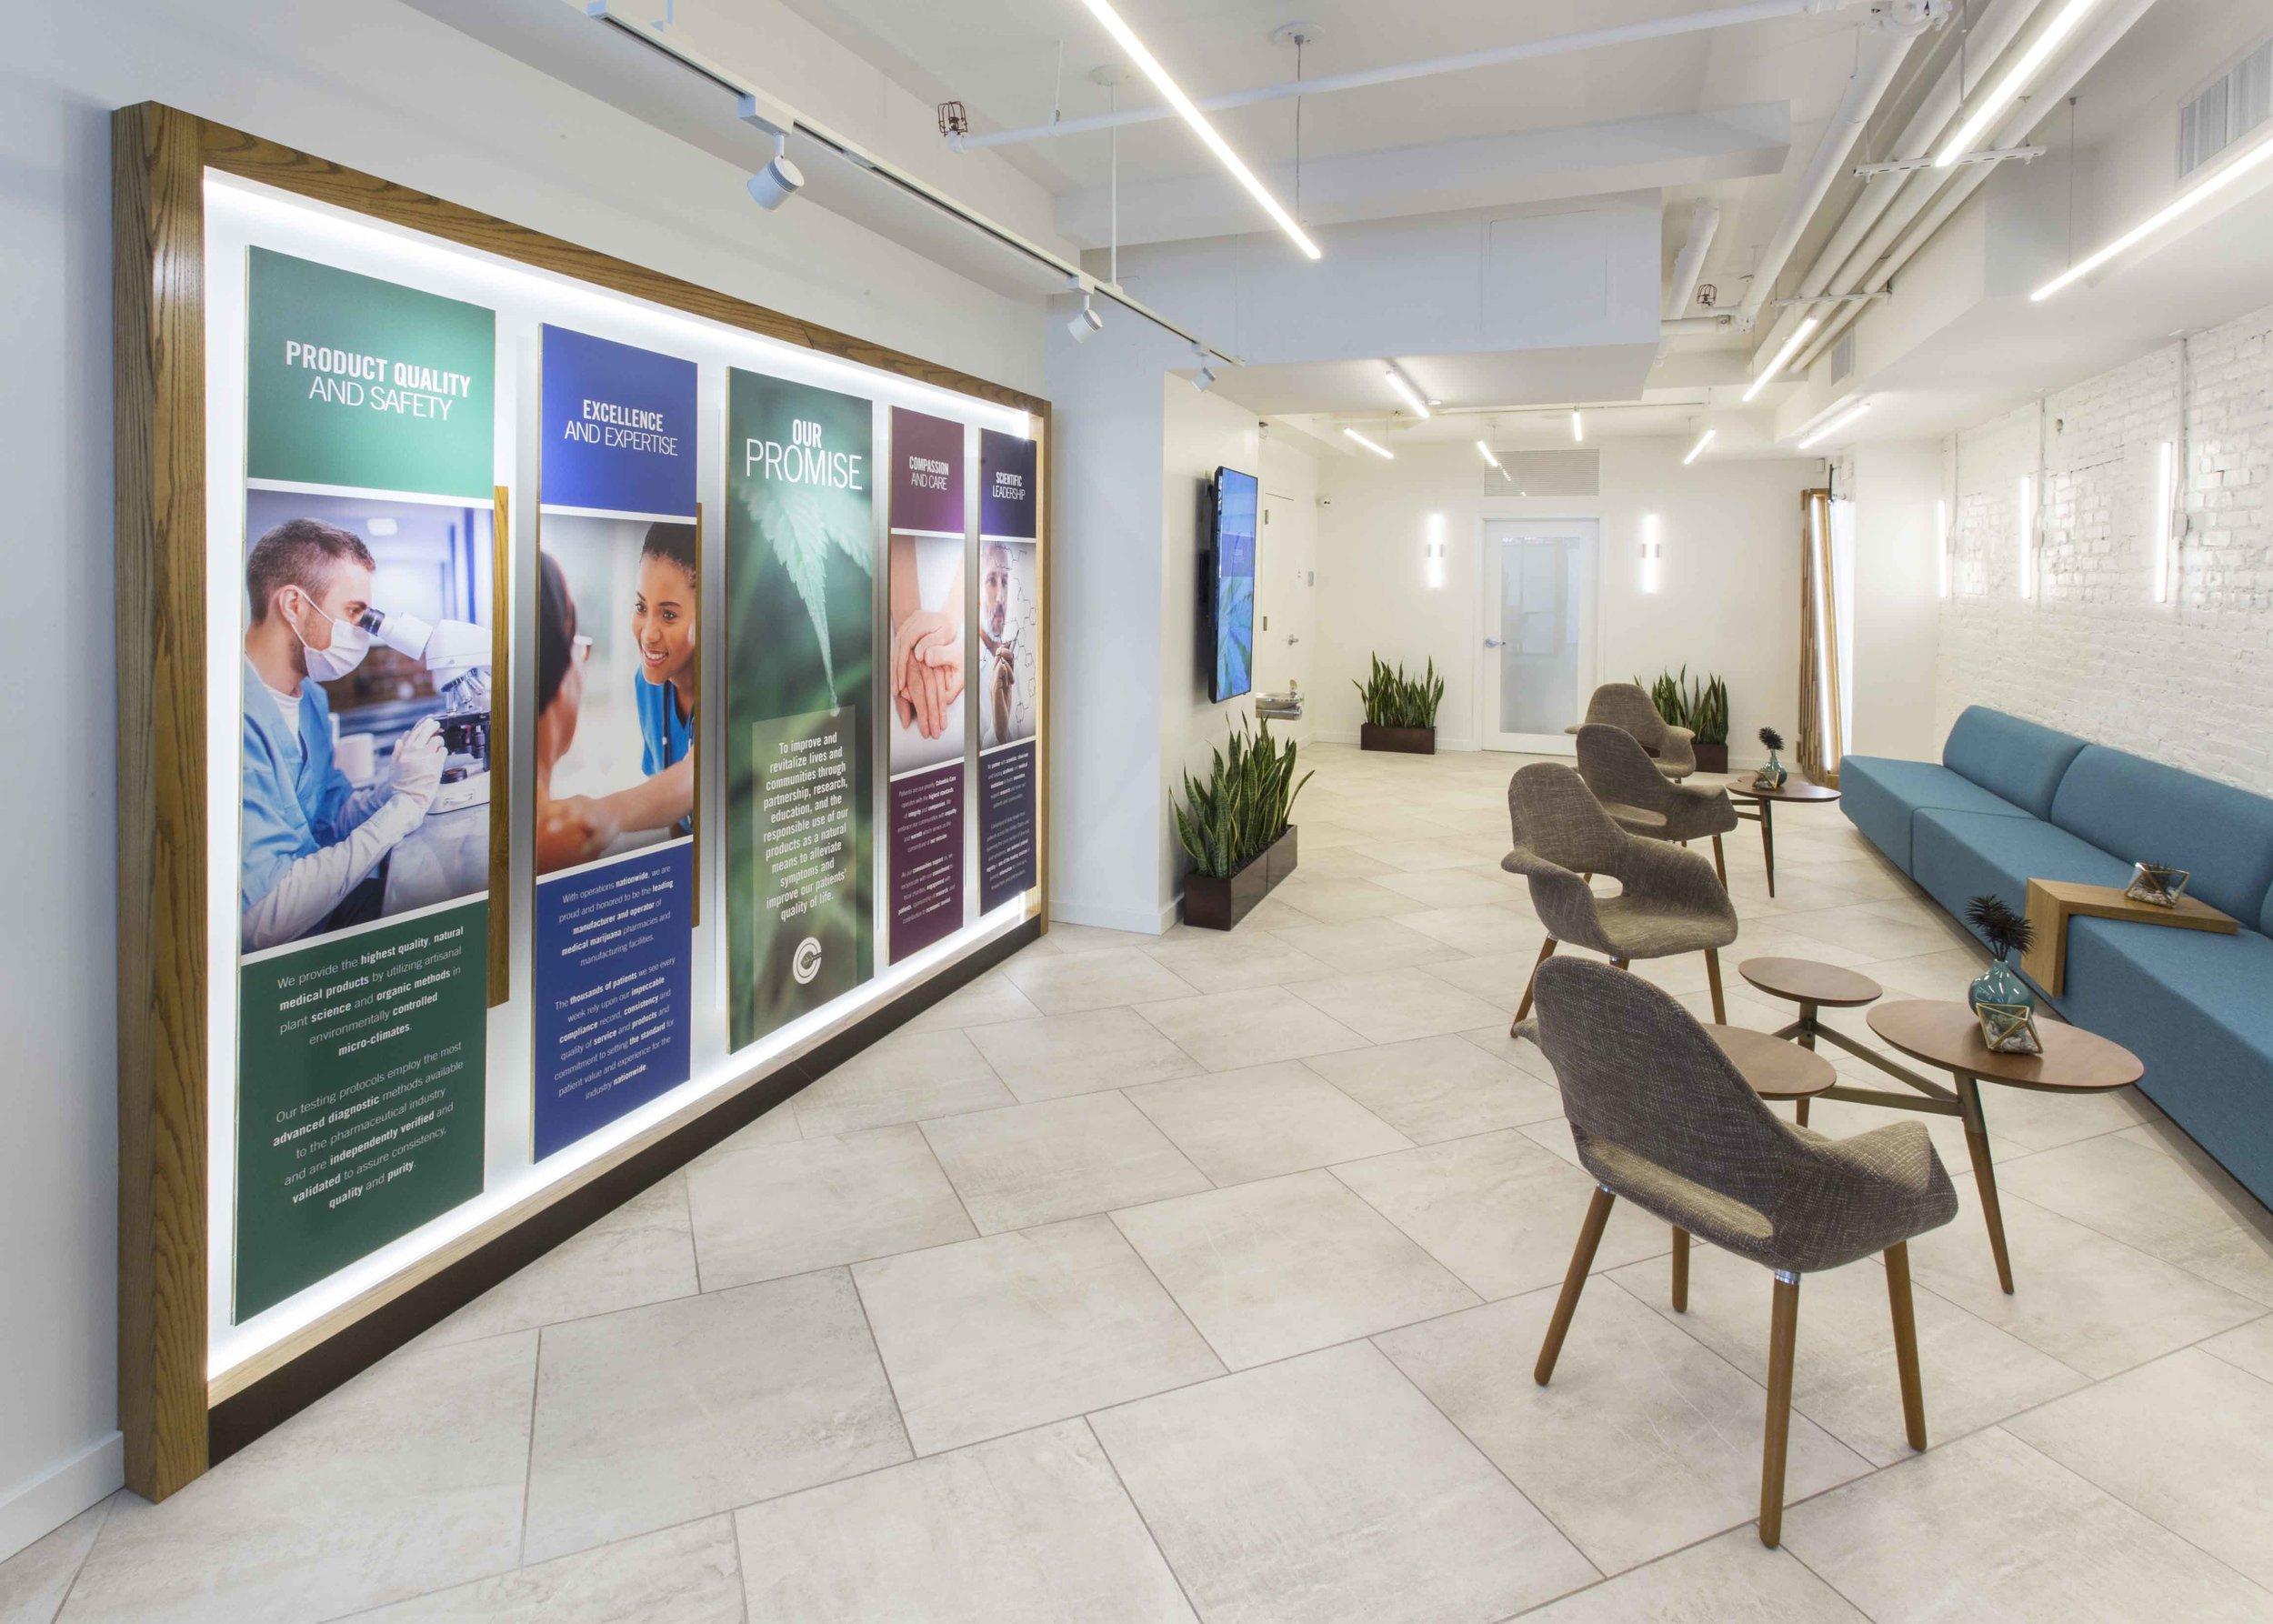 2-Columbia-Care-medical-marijuana-dispensary-waitng-room-evangeline-dennie.jpg